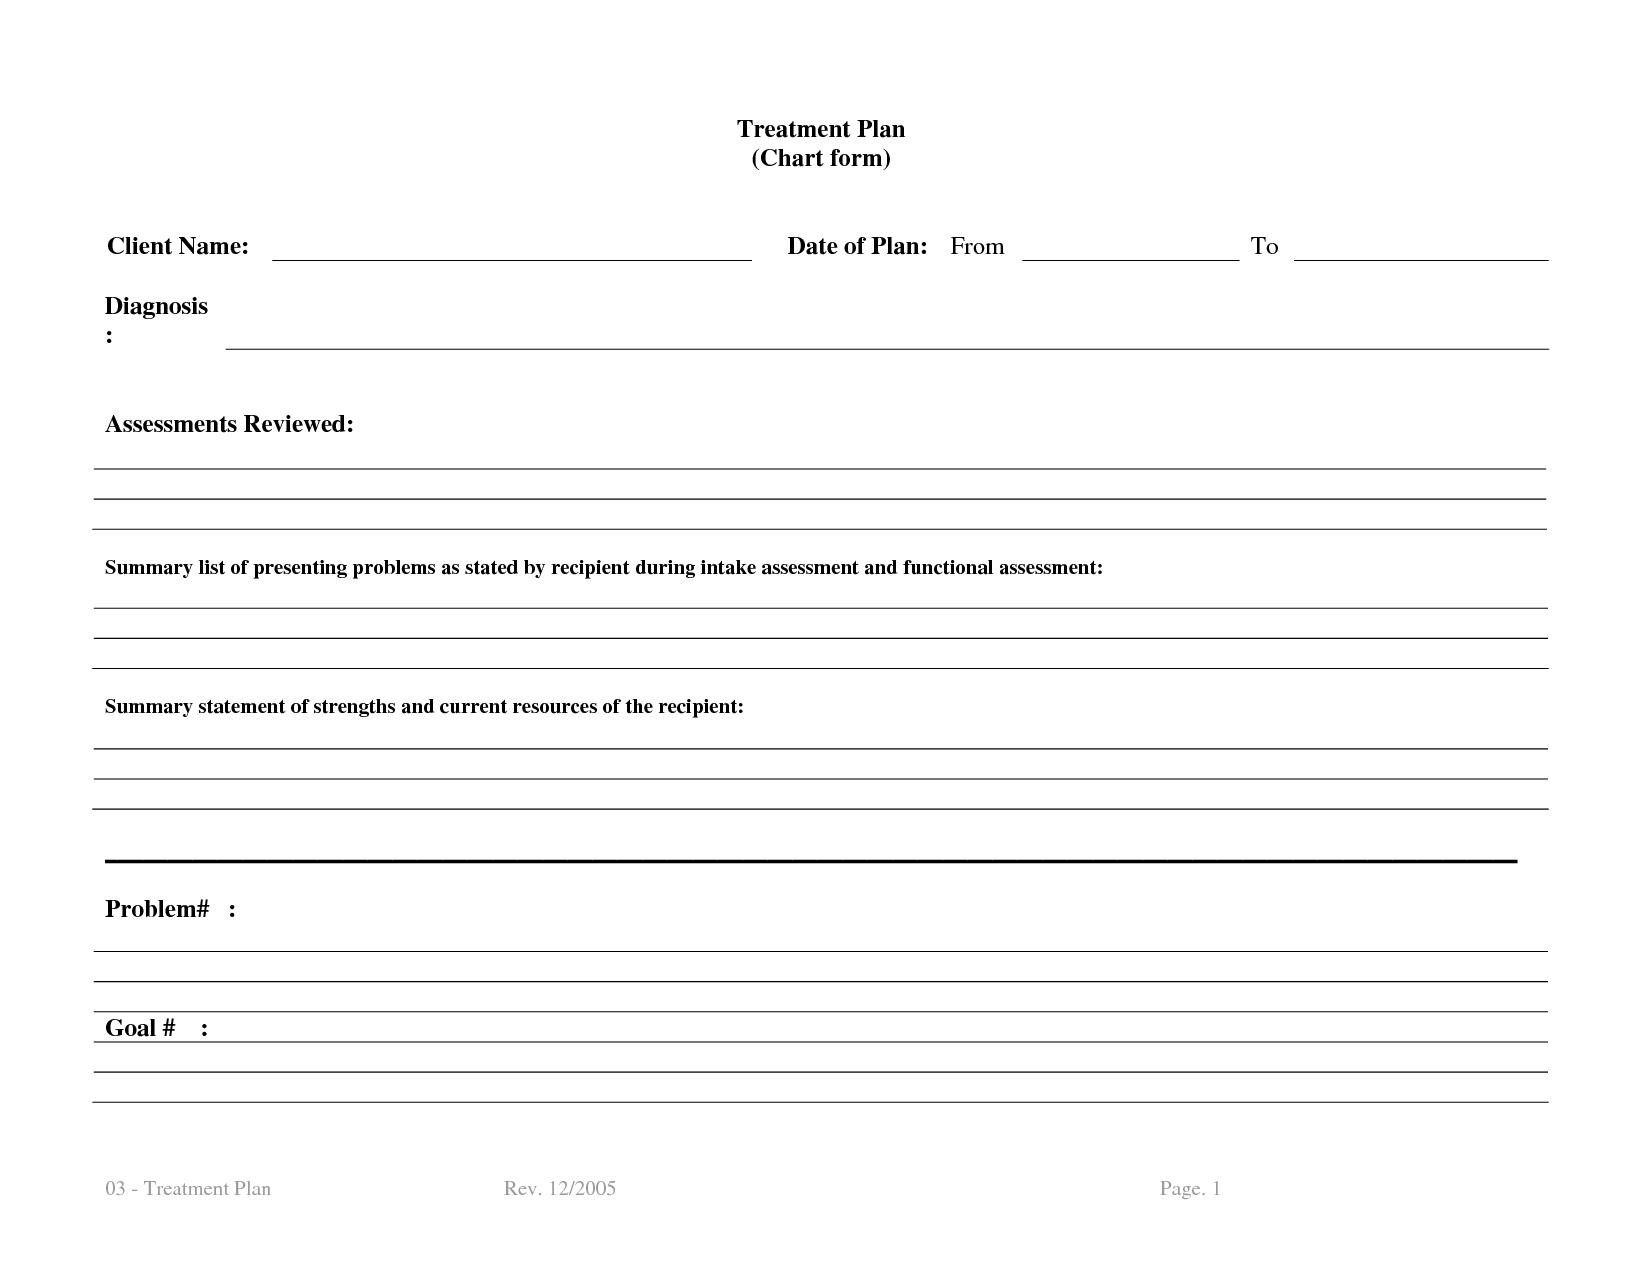 treatment plan template Bm4UCNTx | Therapy | Pinterest